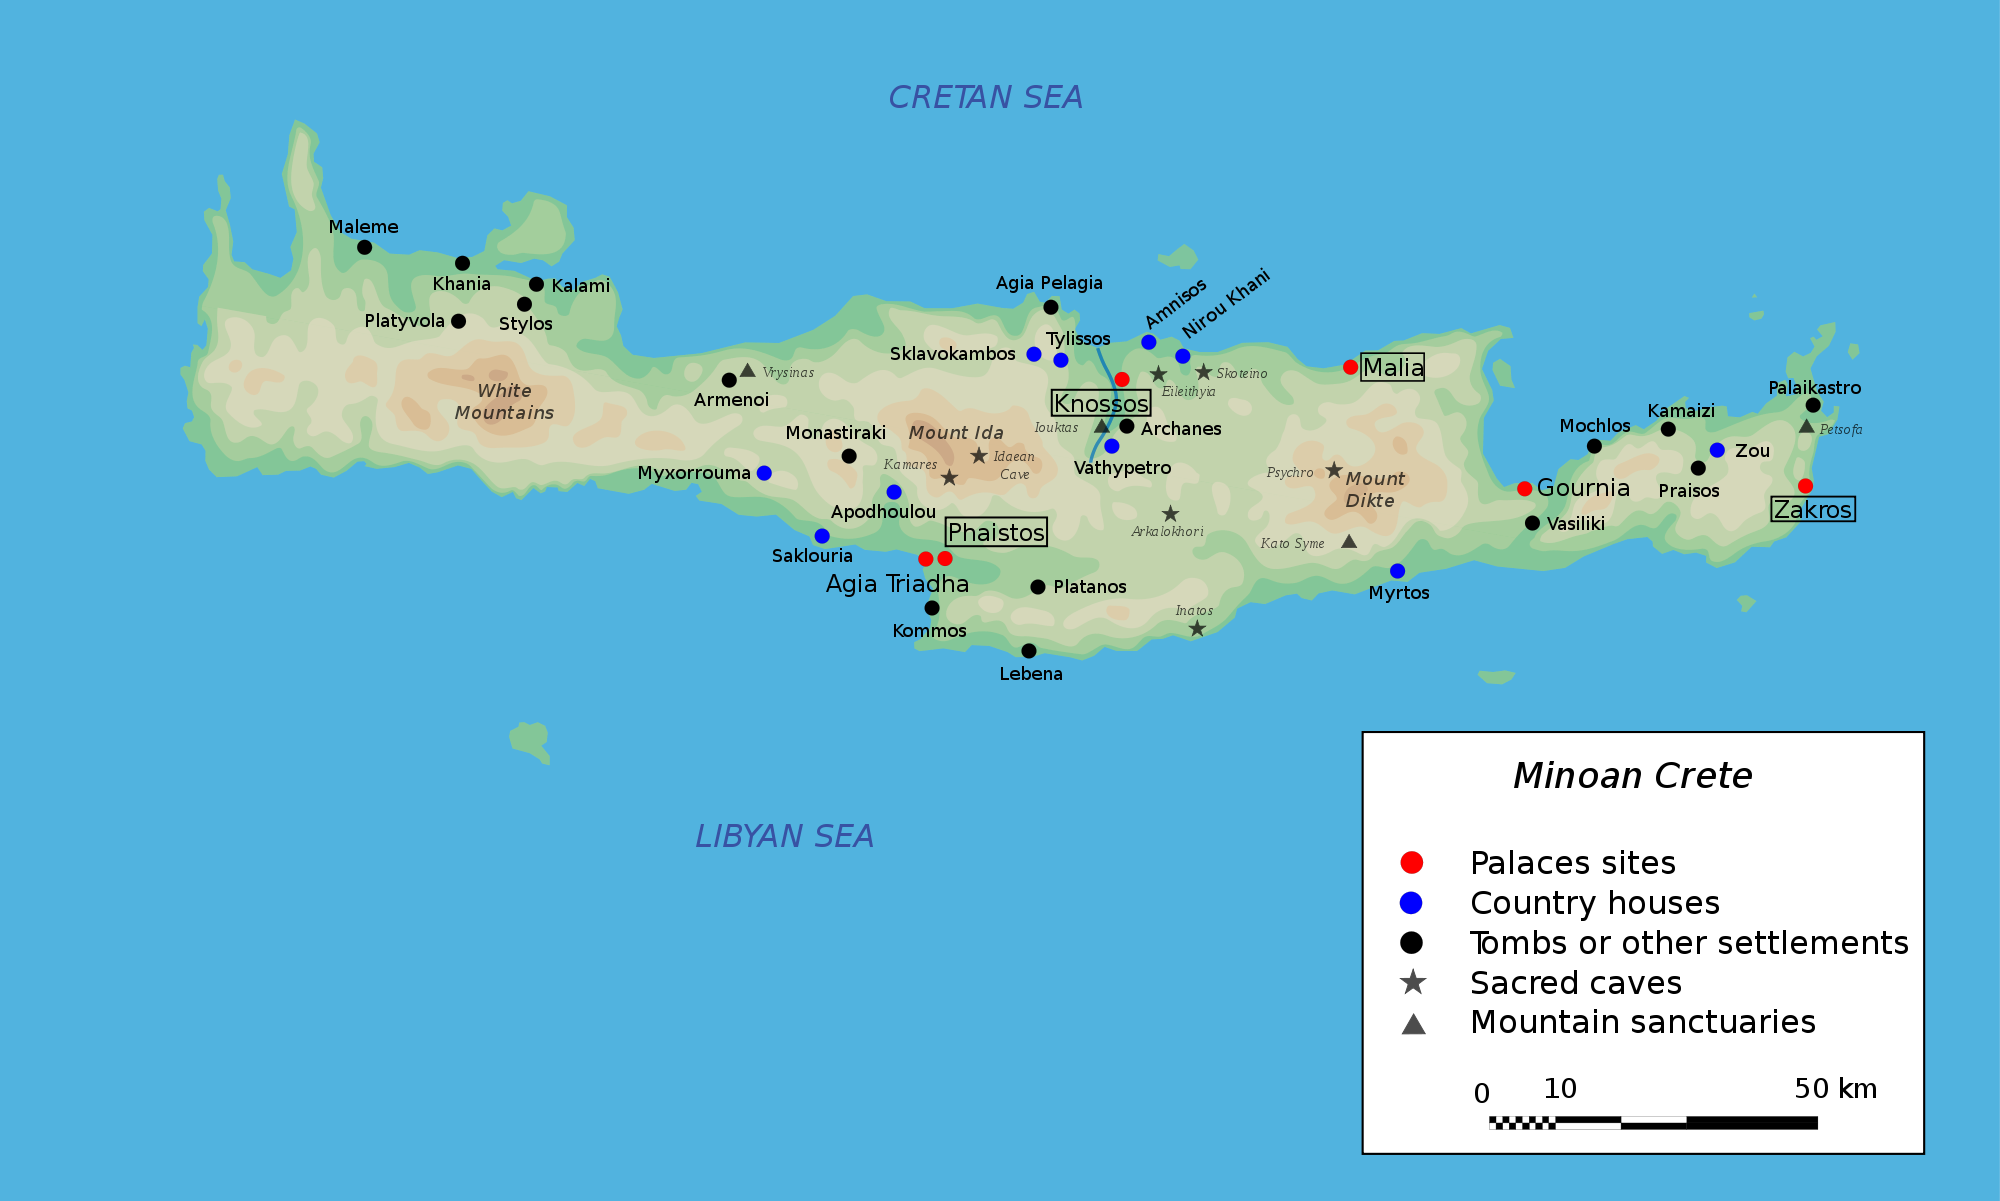 Map Of Crete Map of Minoan Crete (Illustration)   Ancient History Encyclopedia Map Of Crete